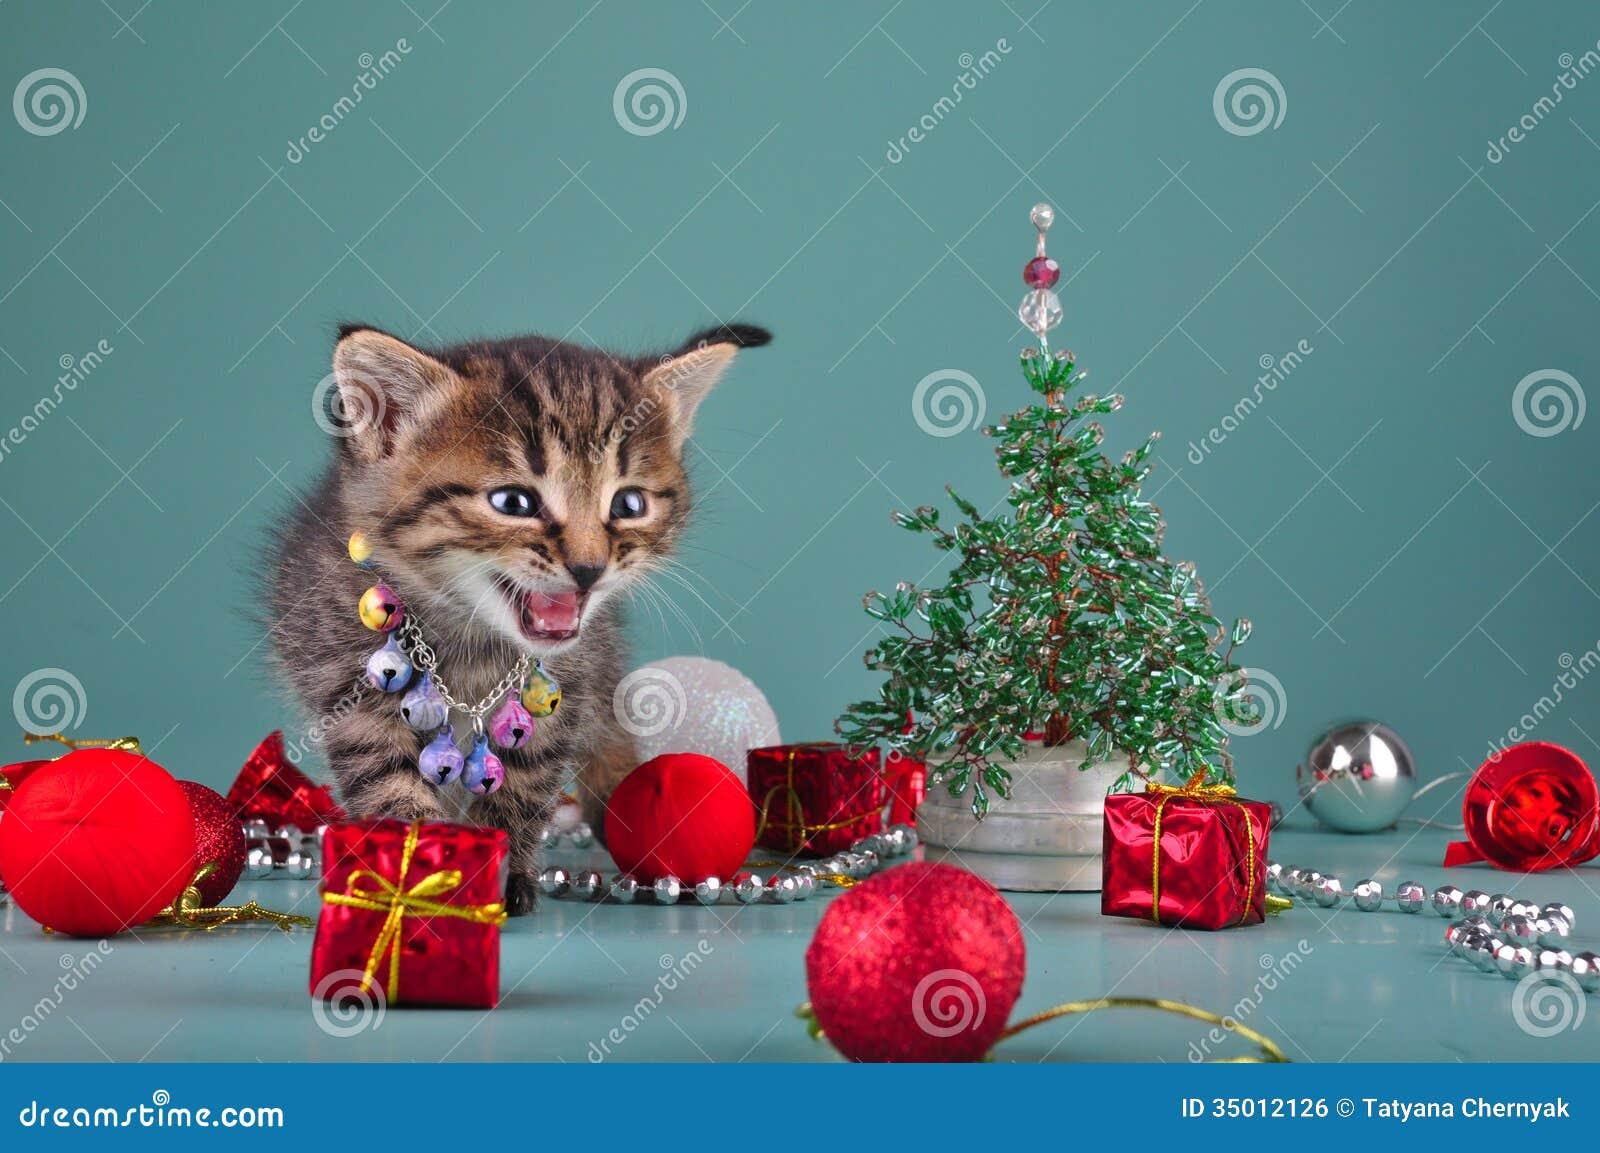 Pics Of Christmas Stuff small kitten among christmas stuff royalty free stock image